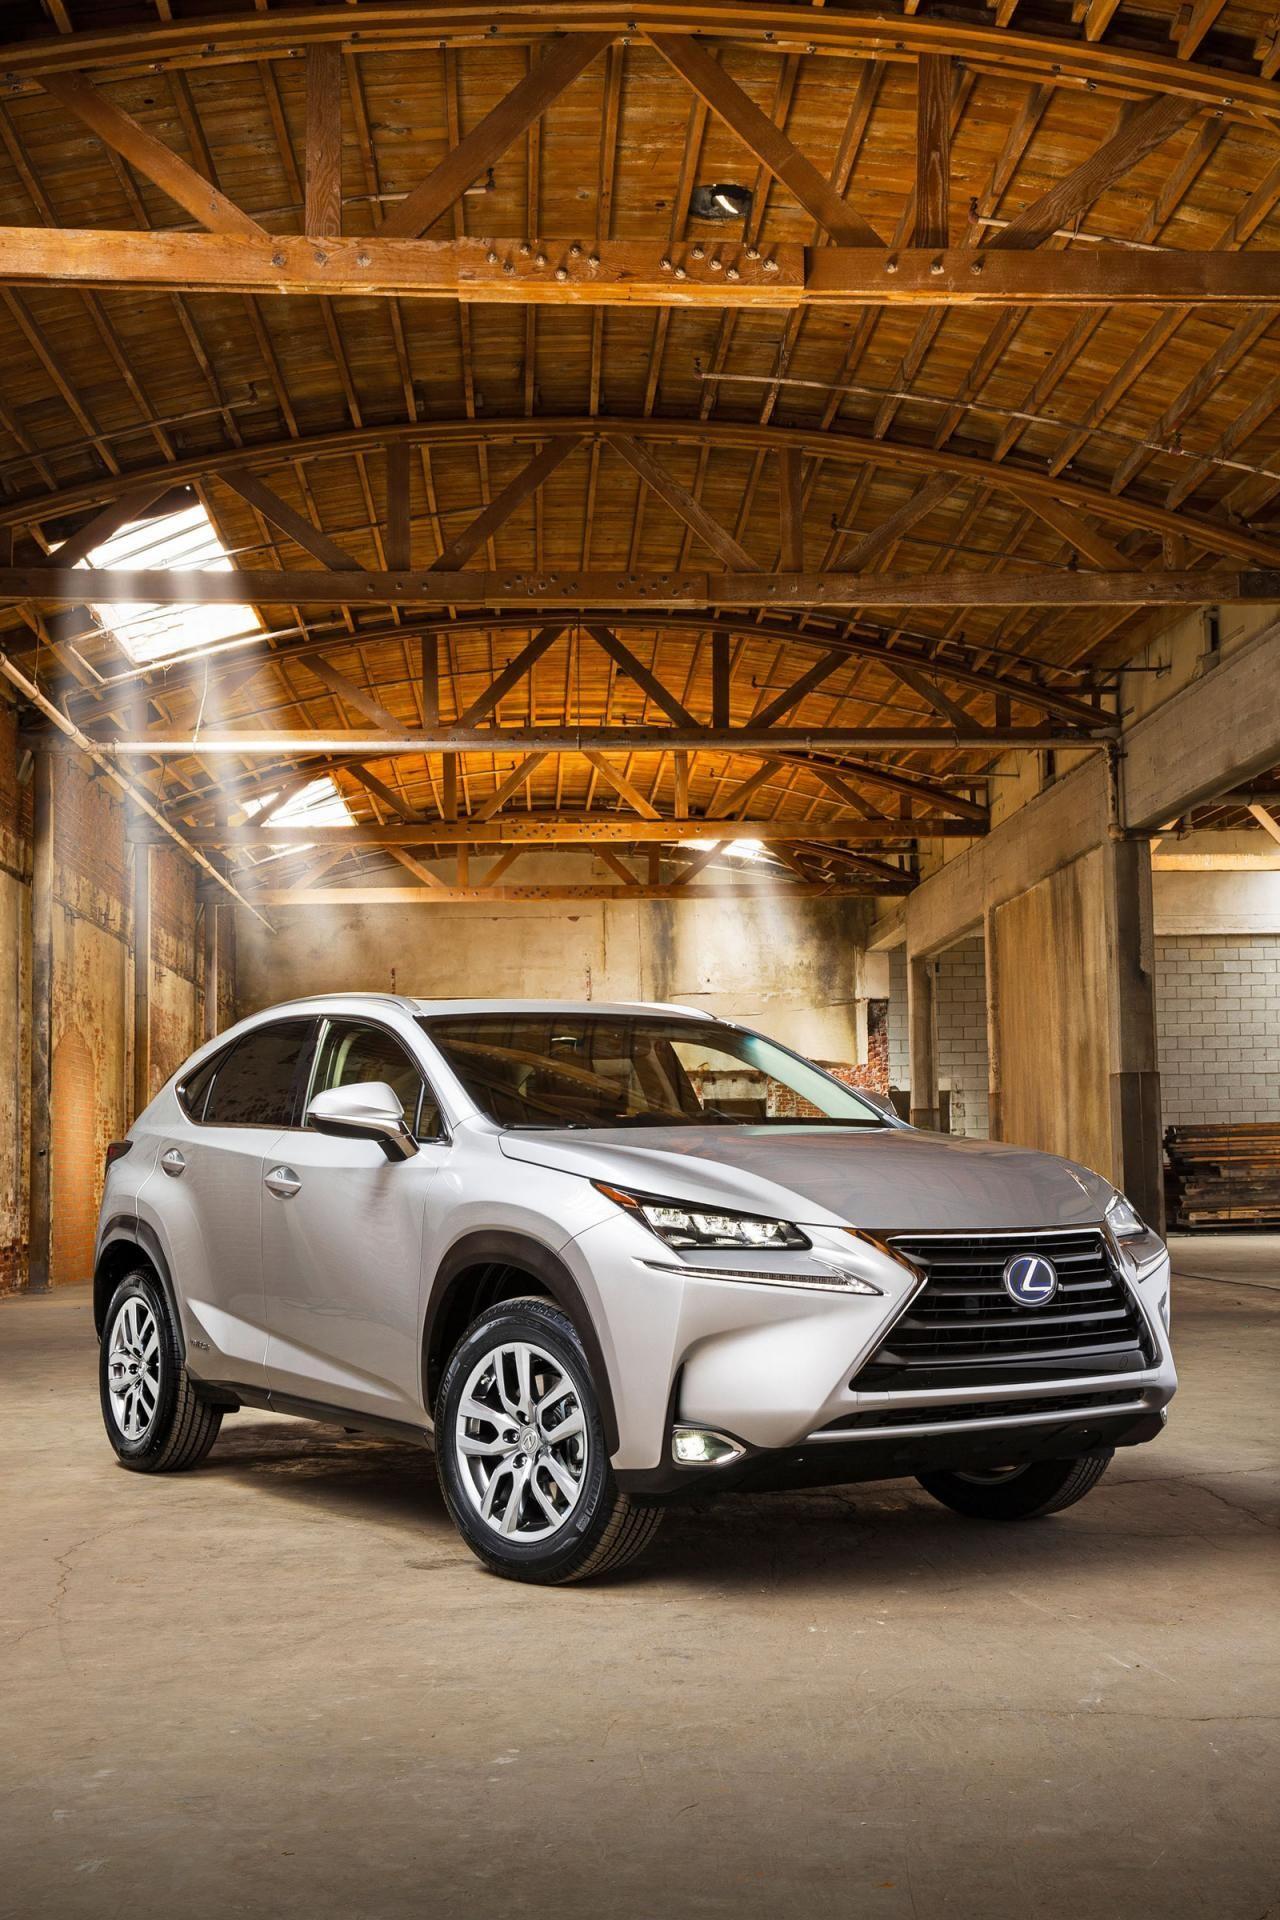 2015 Lexus NX 300h Hybrid Varient CARS Pinterest